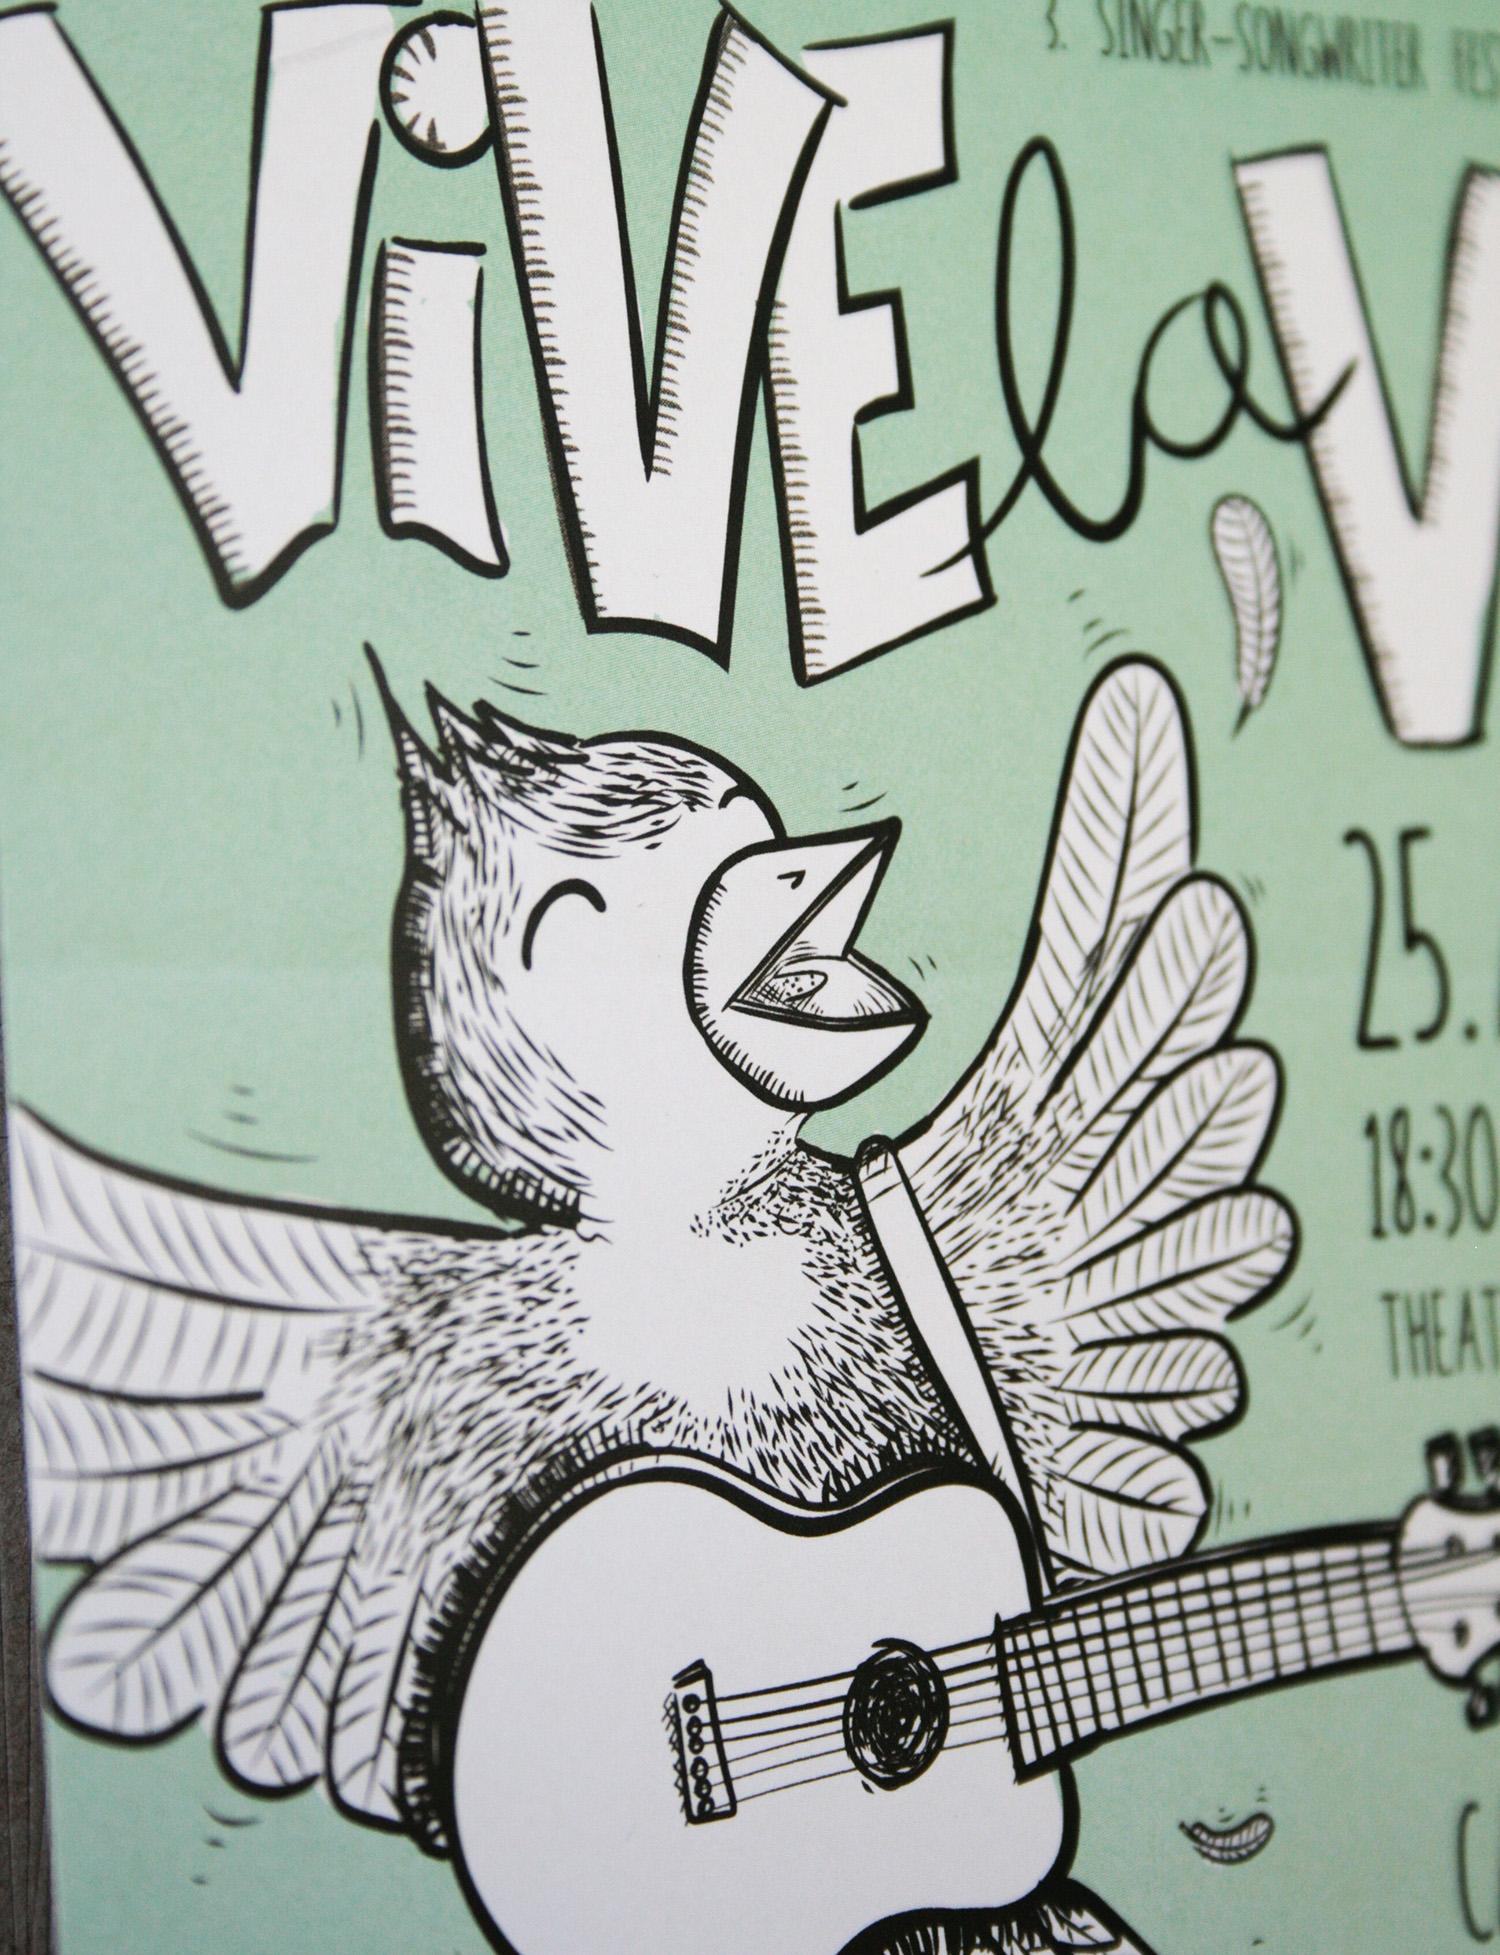 Vive la Vie Plakat 2015 Nahaufnahme 2